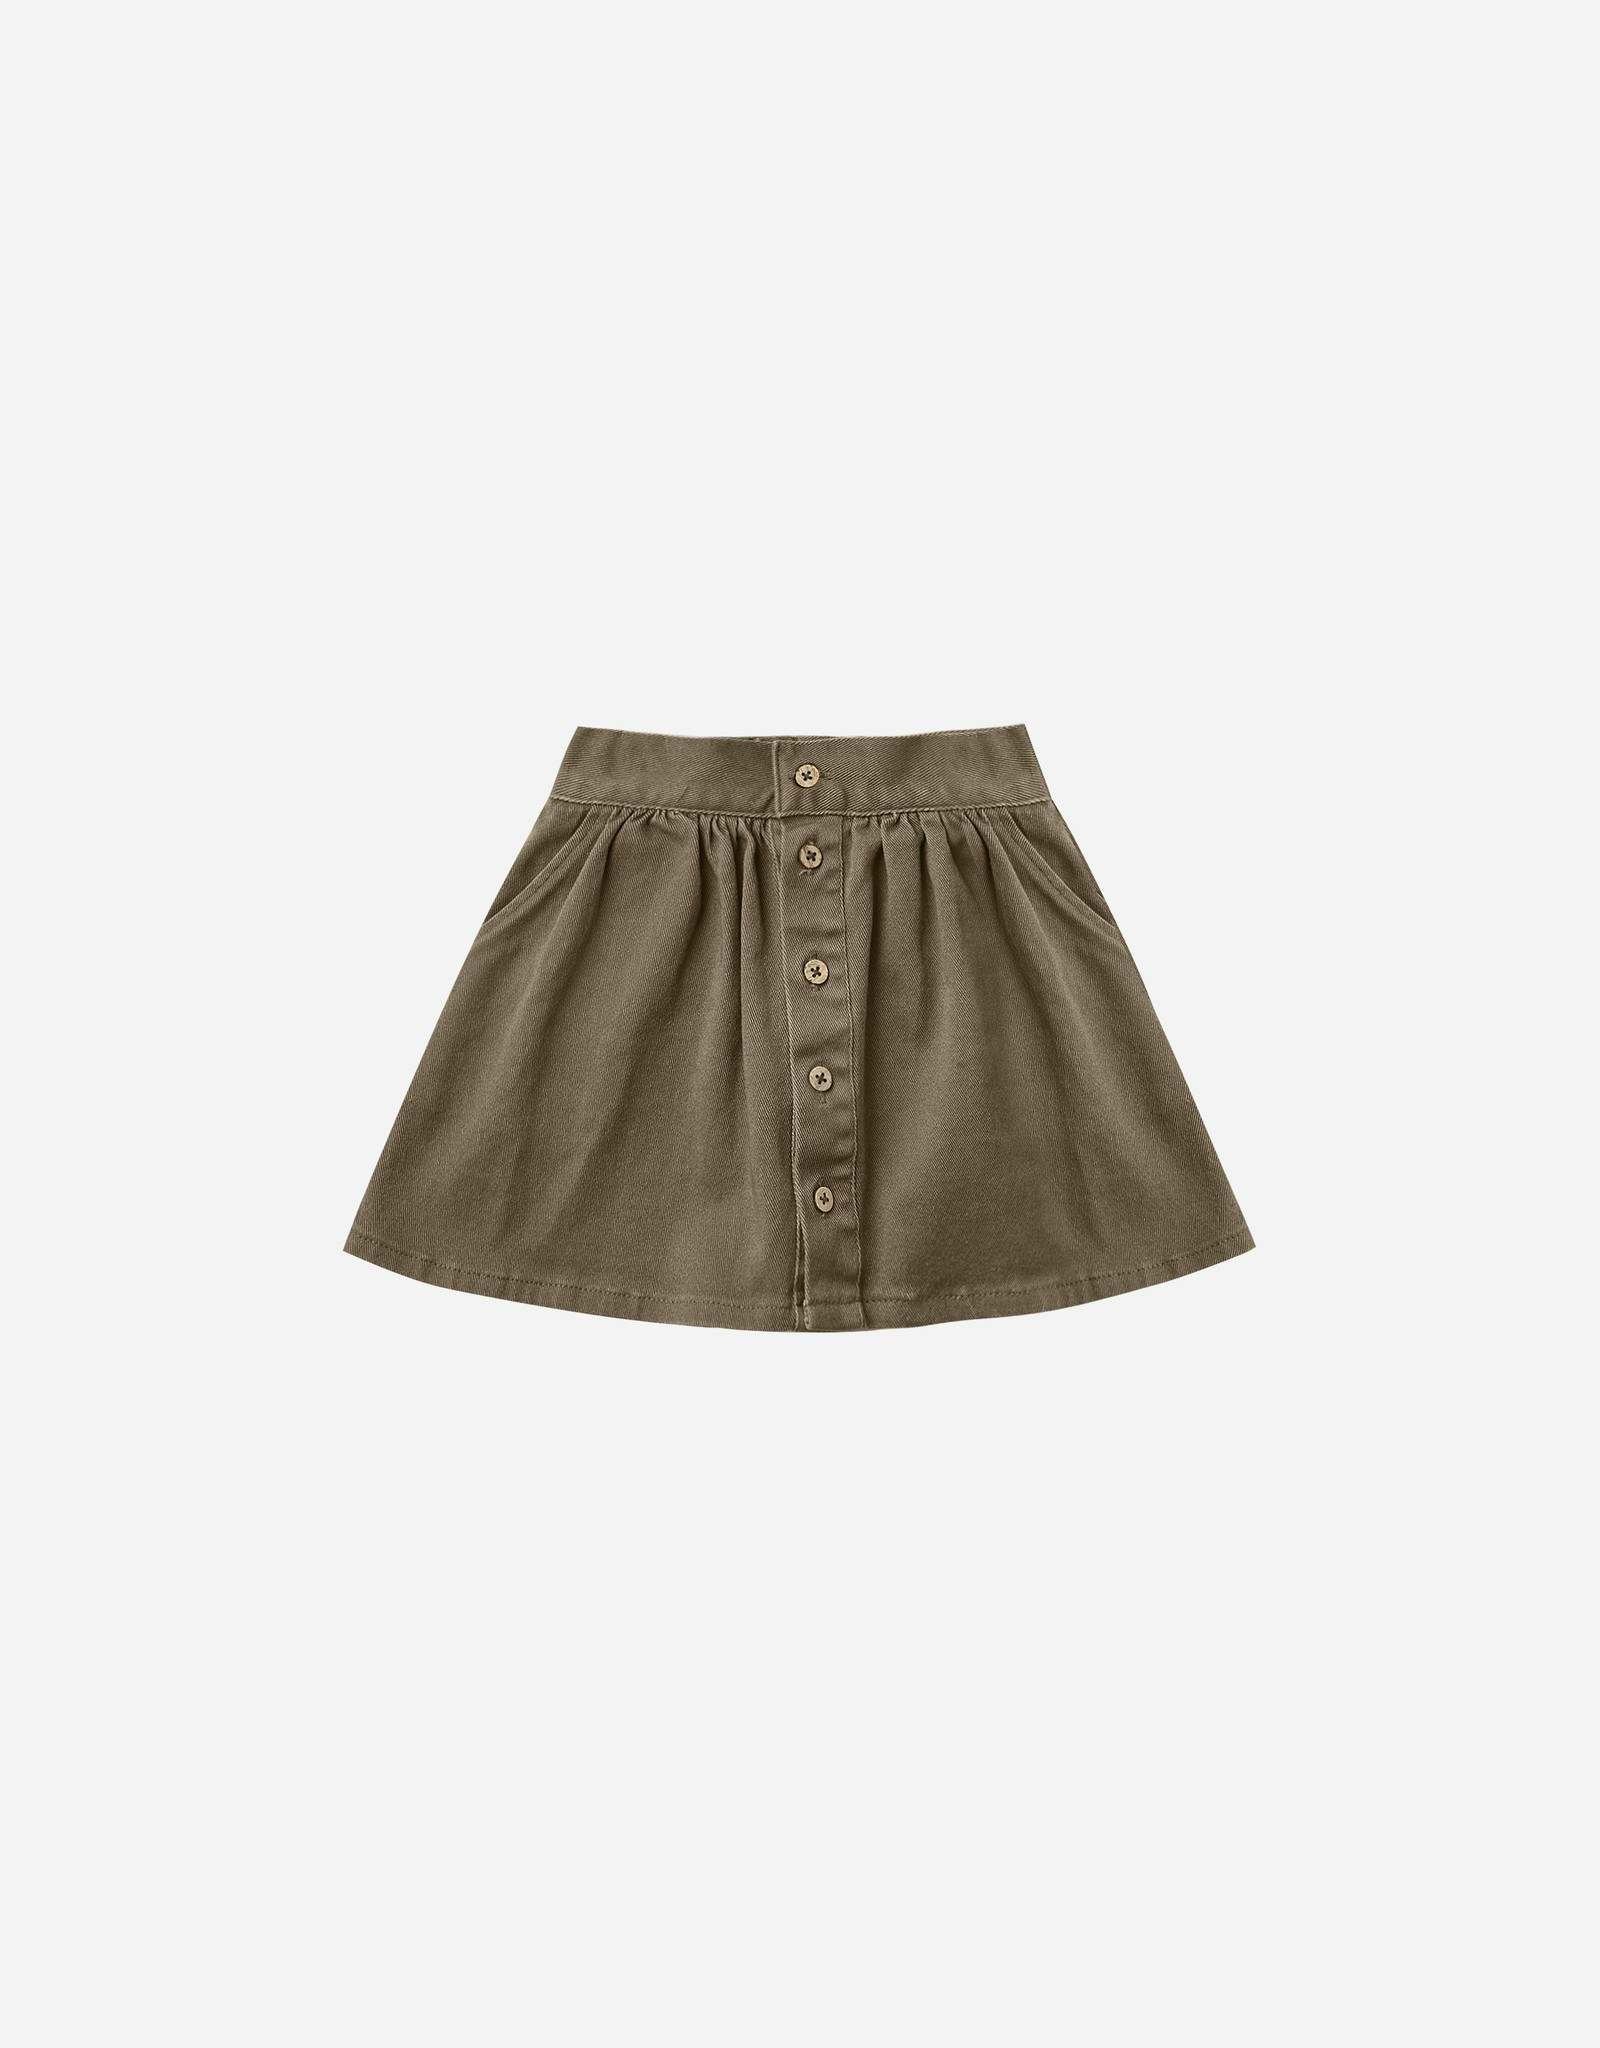 Rylee & Cru Rylee & Cru Button Front Mini Skirt Olive